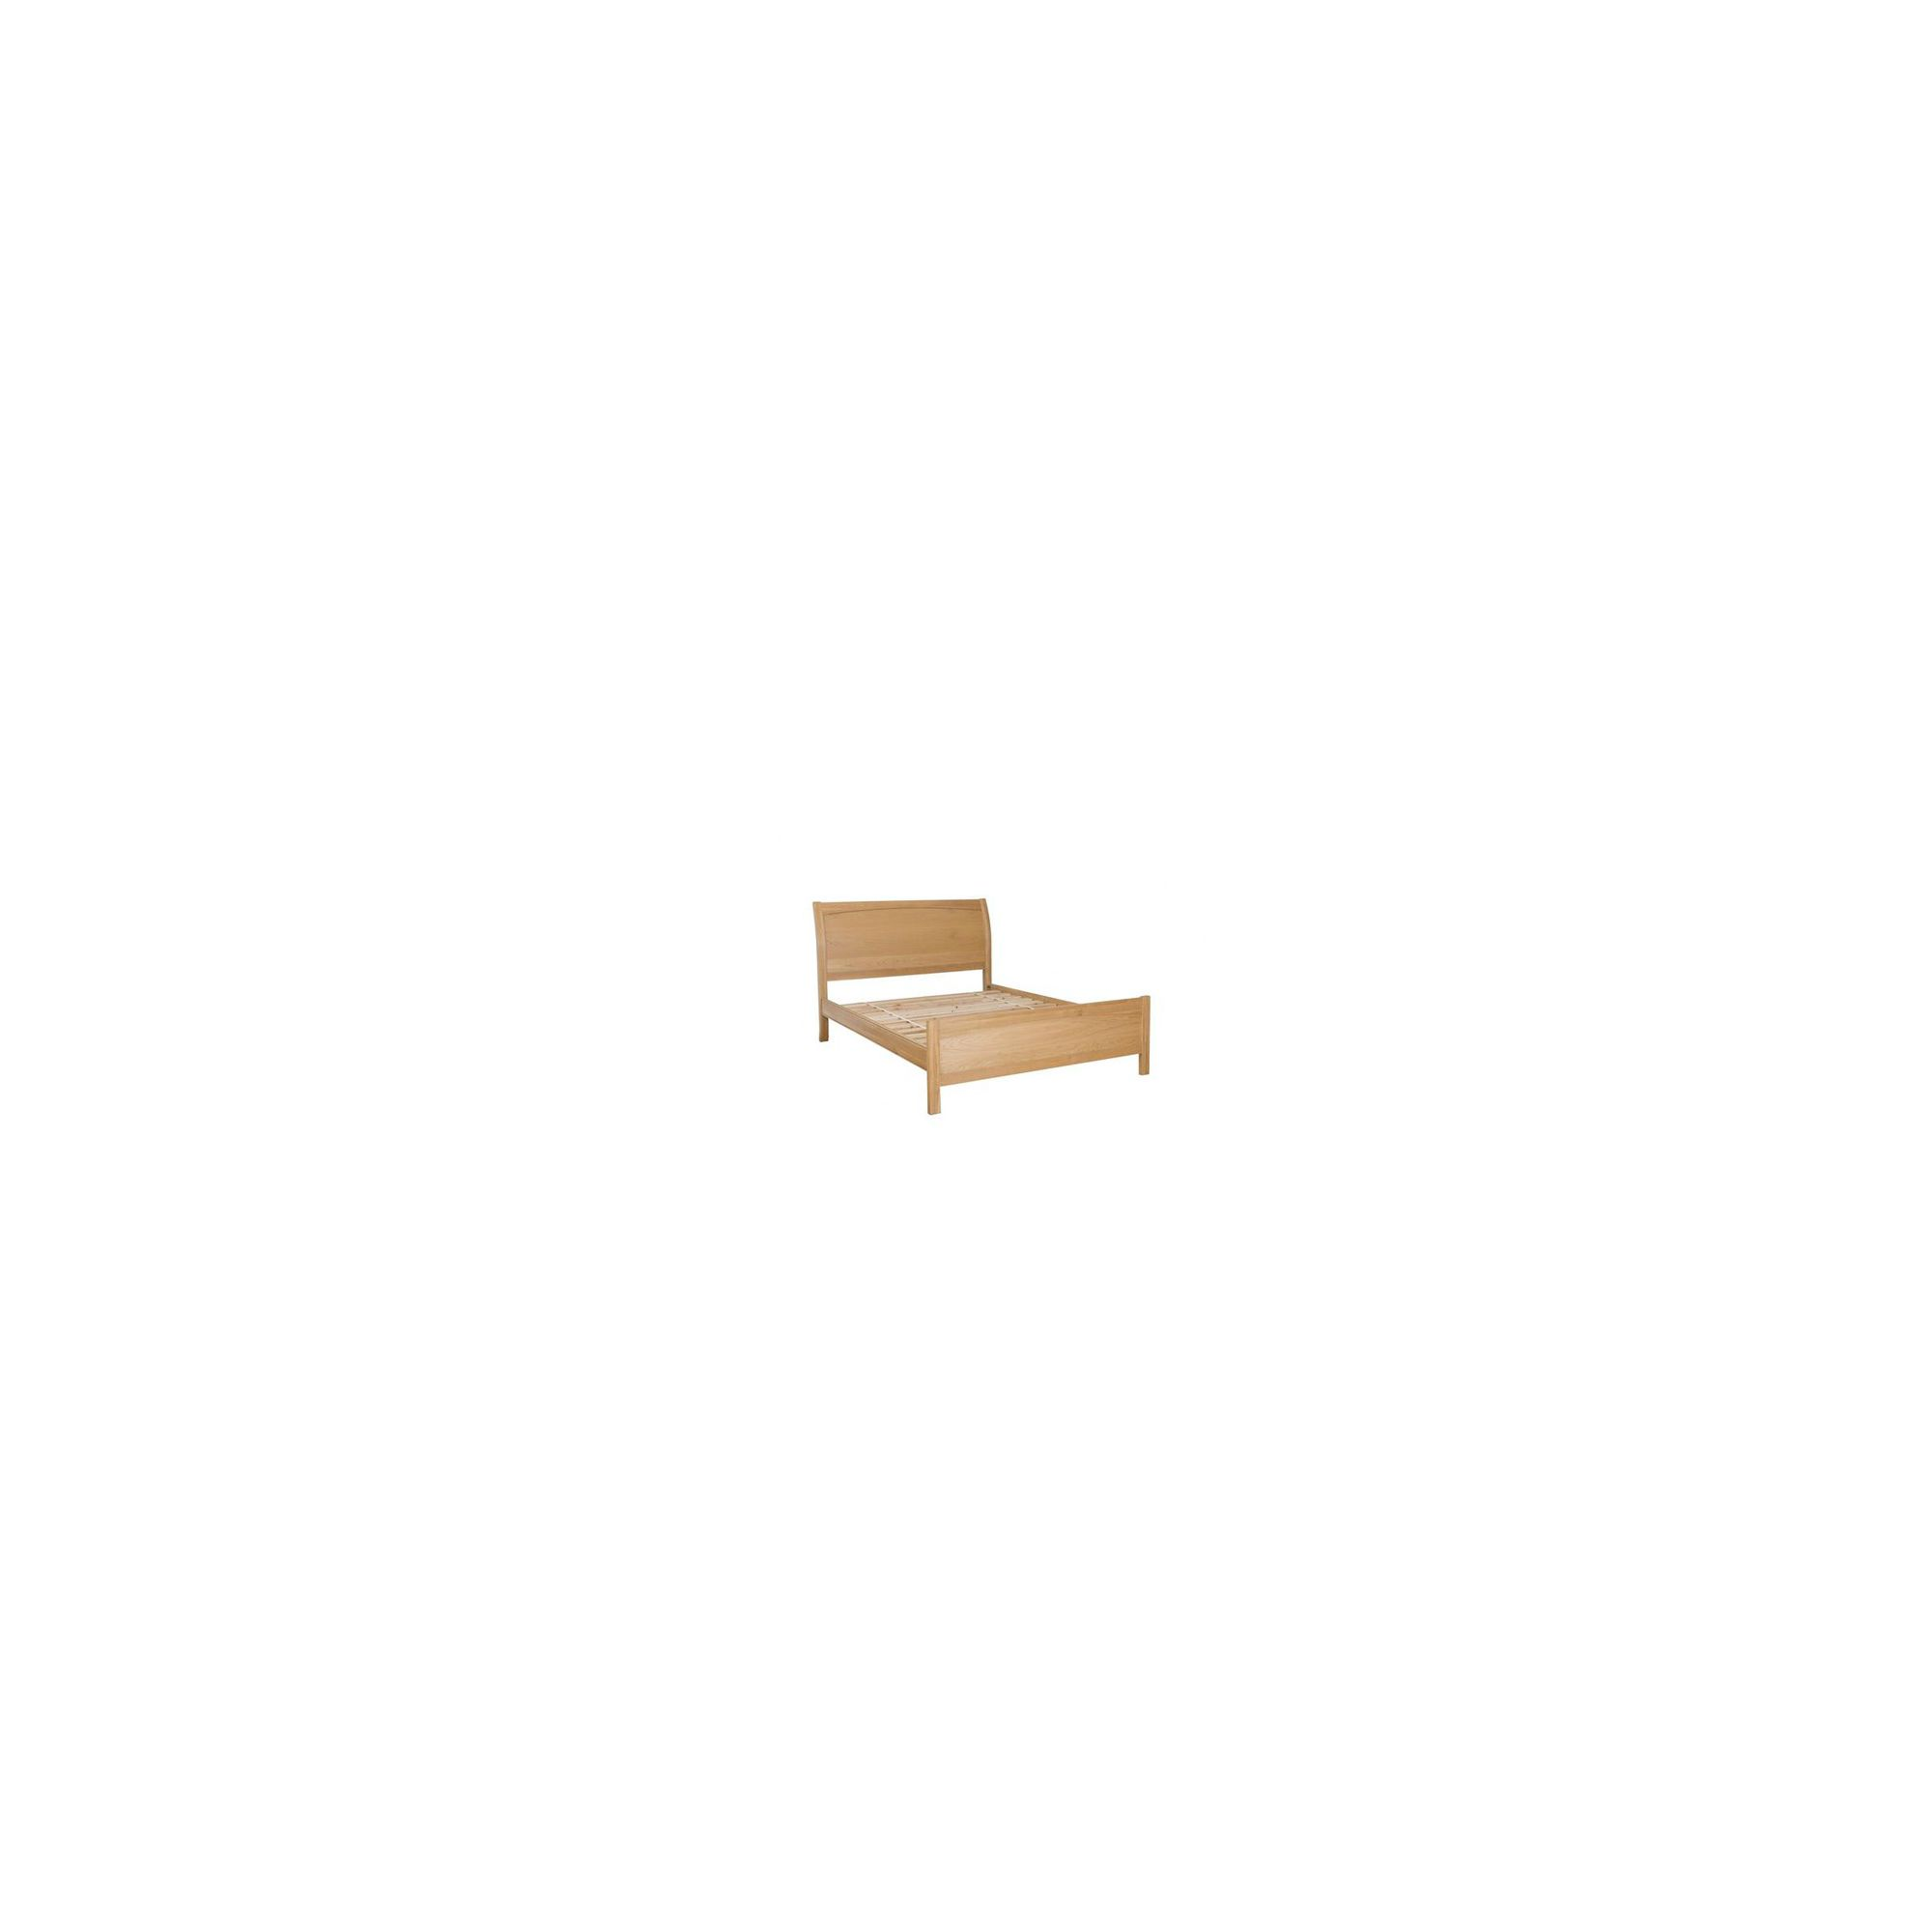 Oakinsen Balmain Bed Frame - King at Tesco Direct